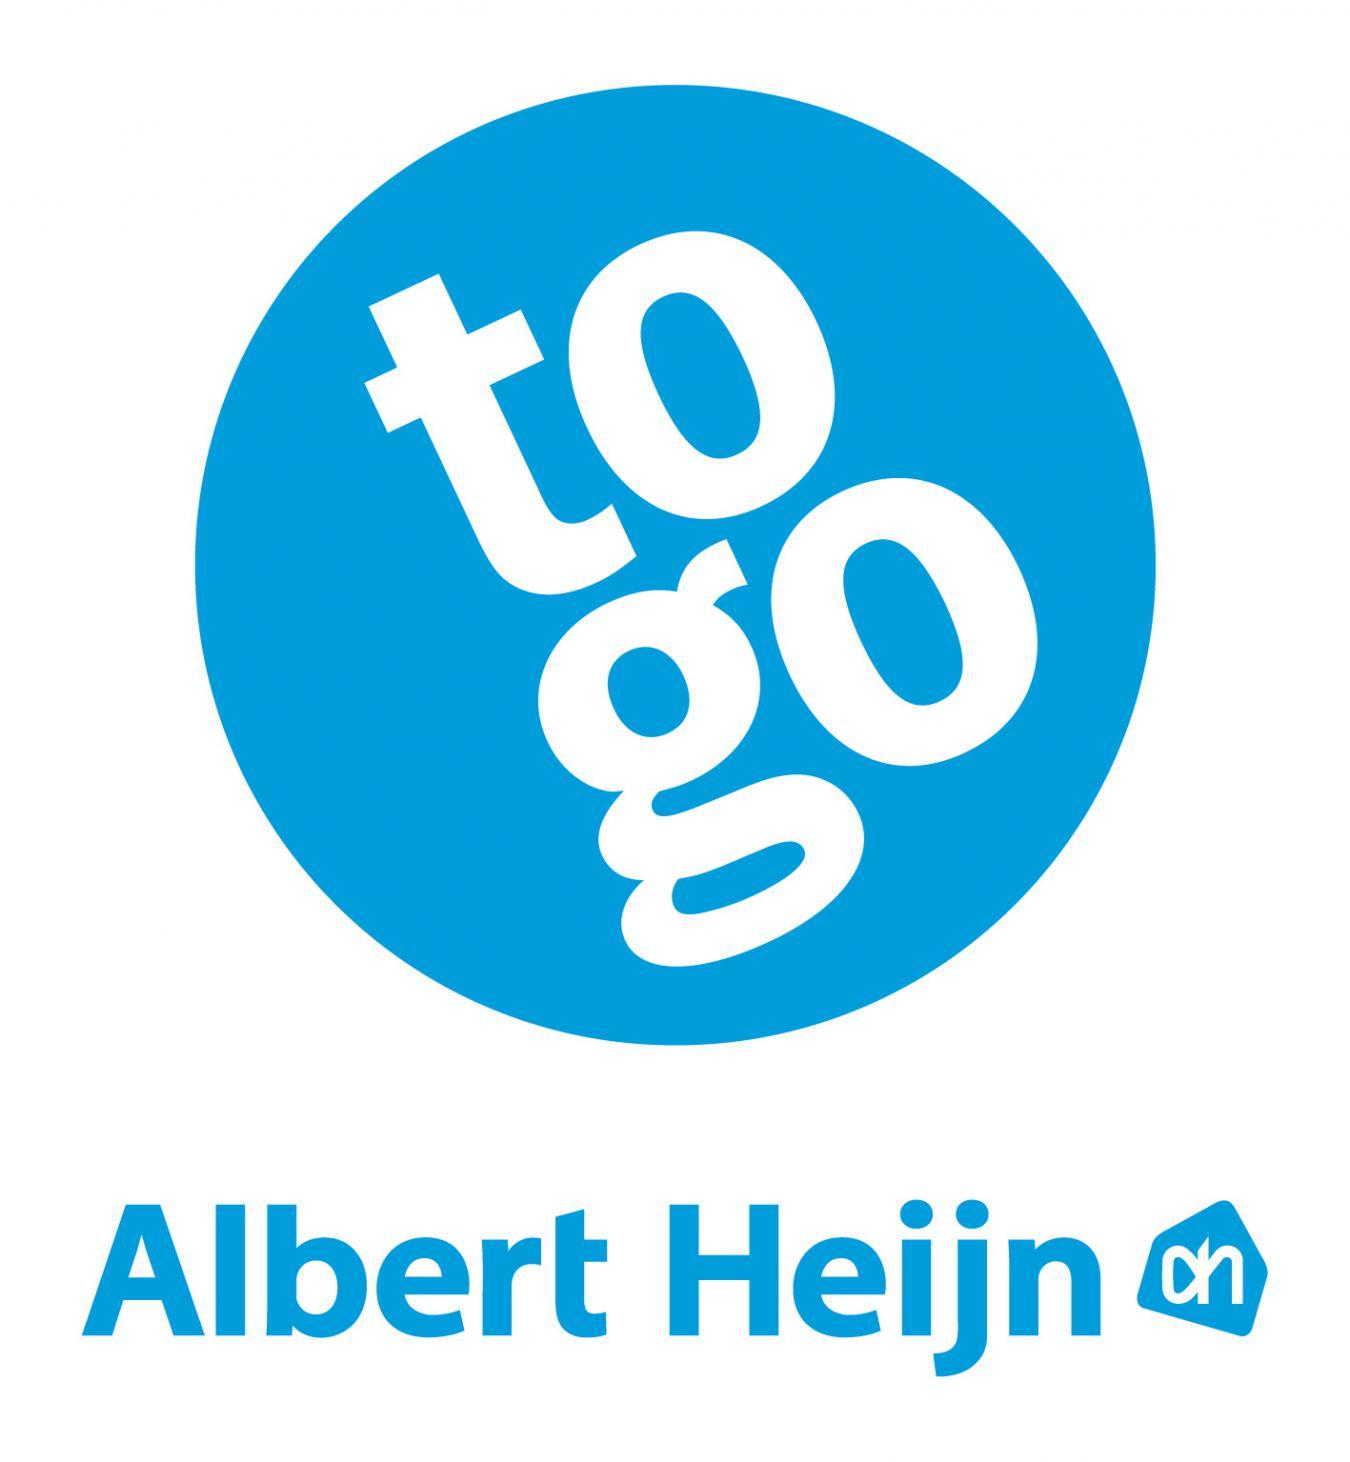 http://ahtogo.nl/